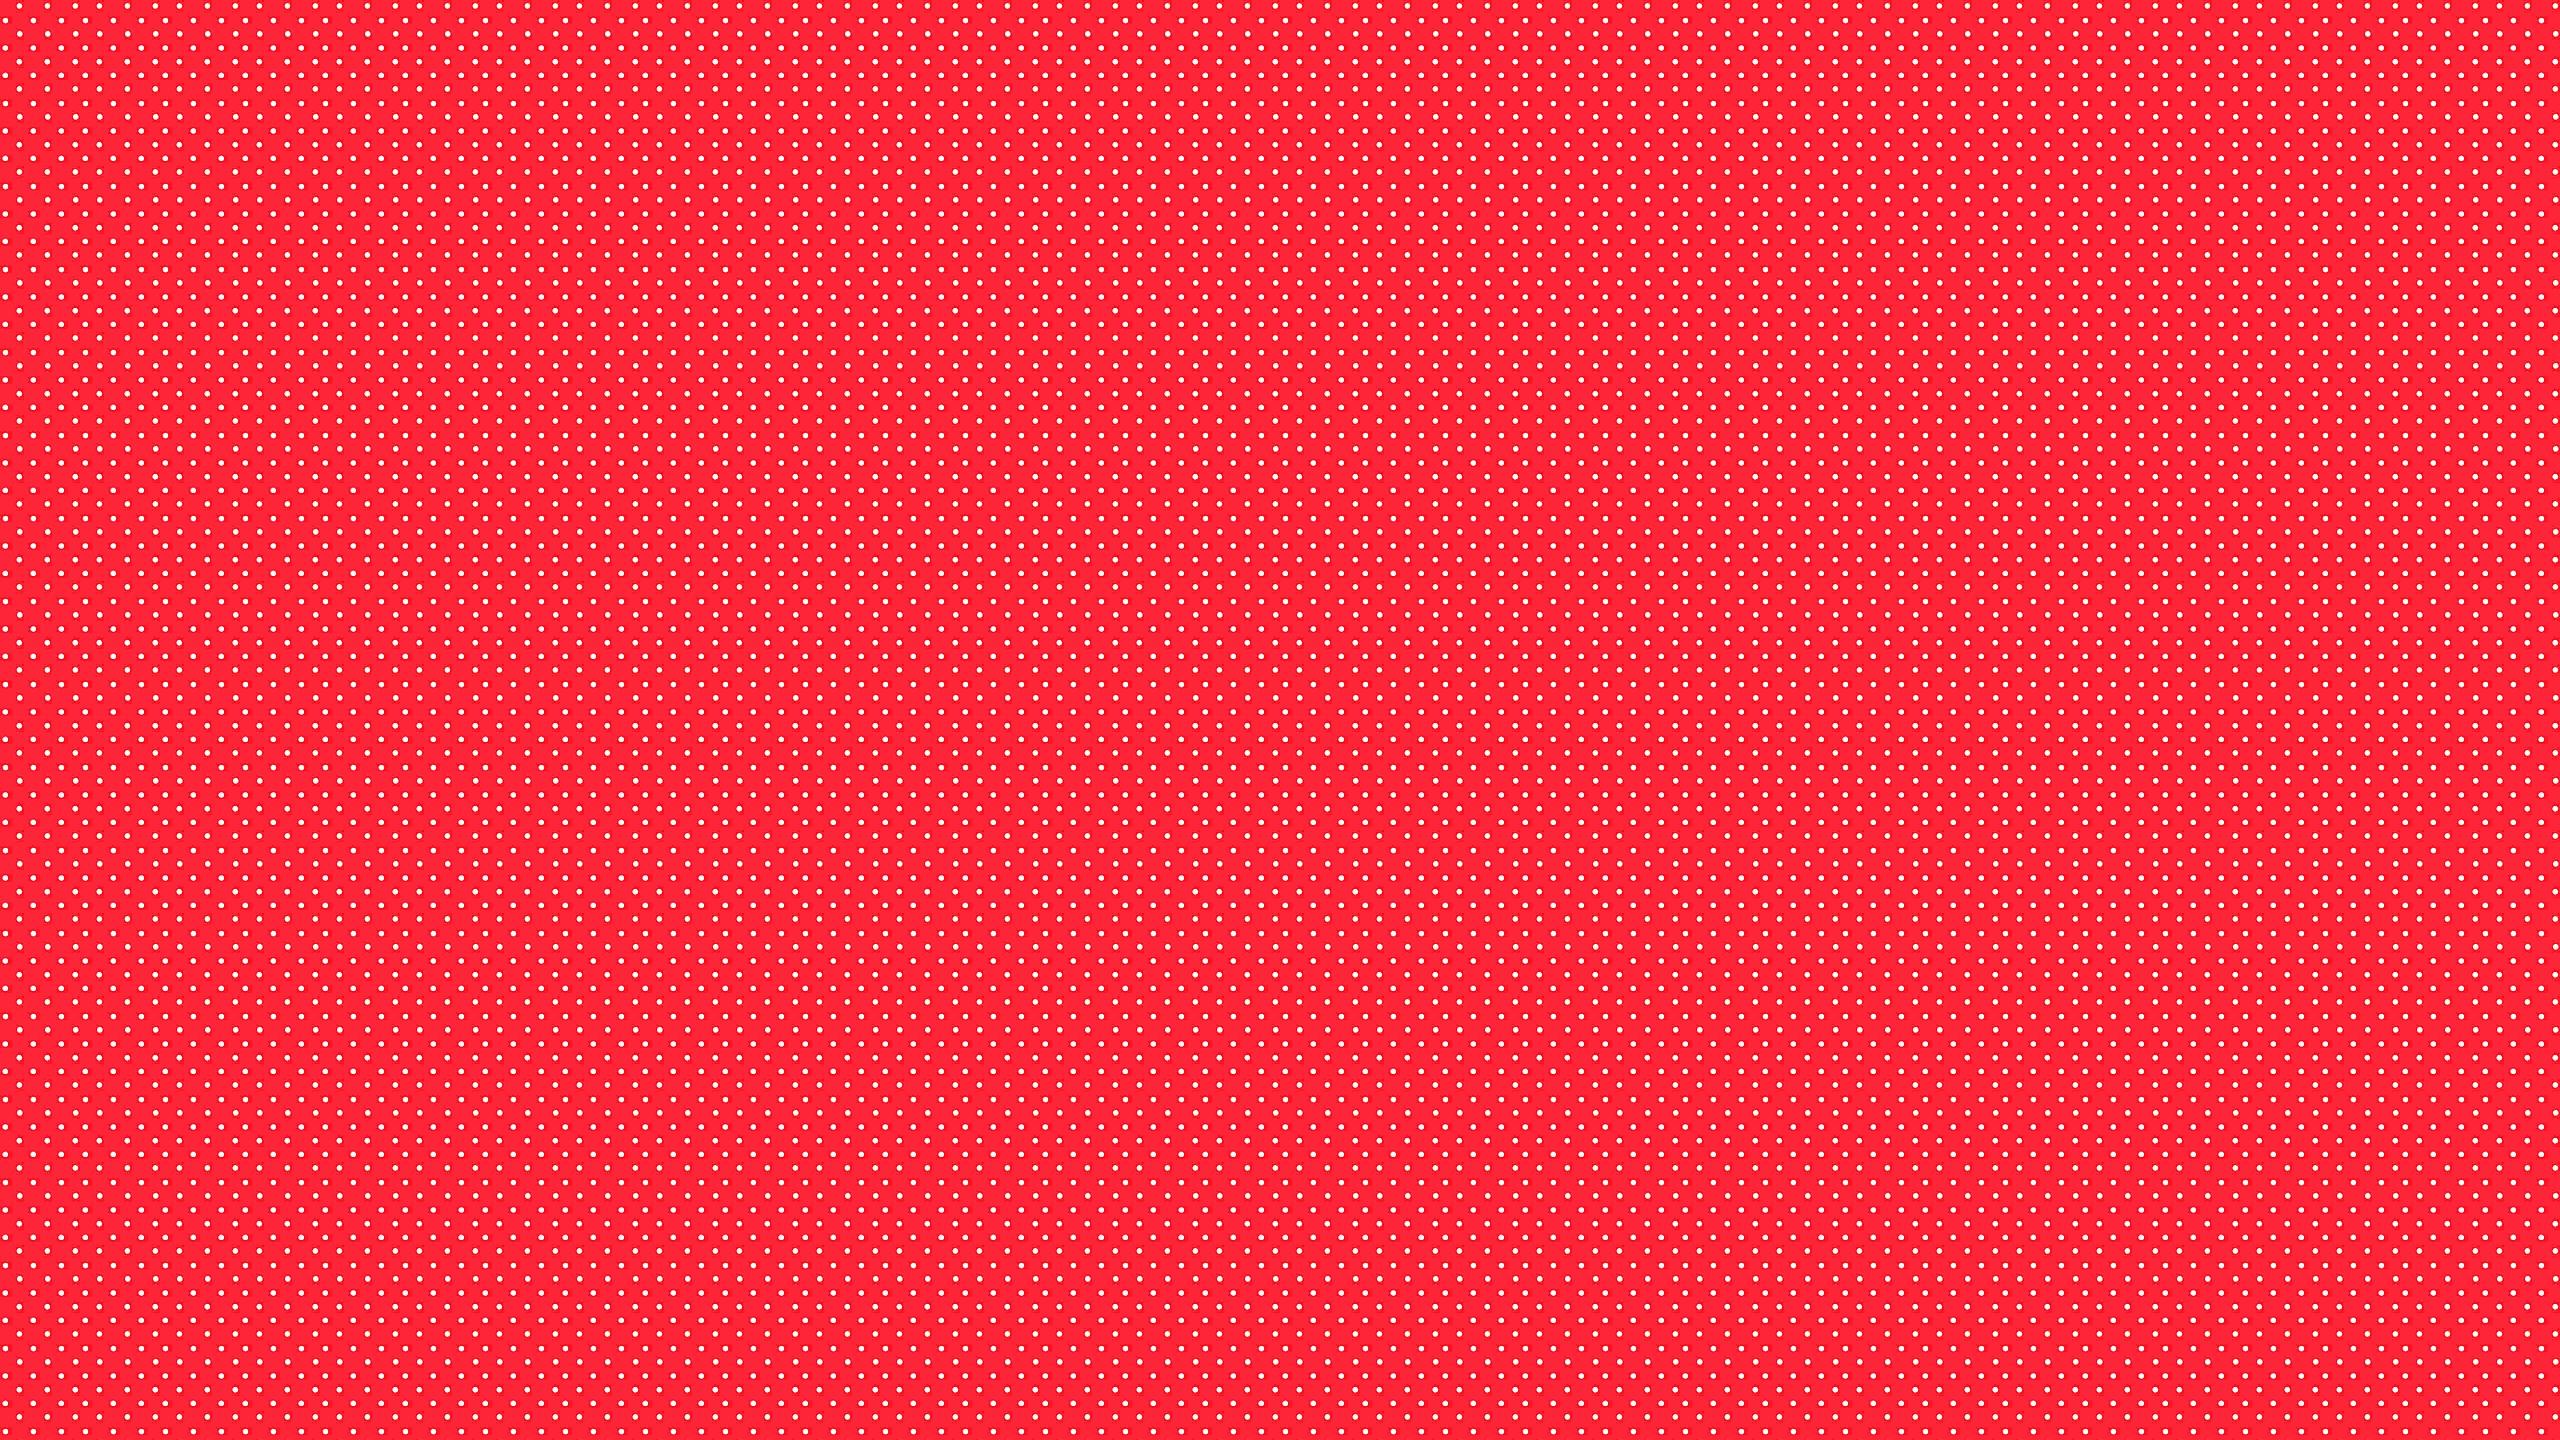 polka dot wallpaper 183�� download free cool high resolution